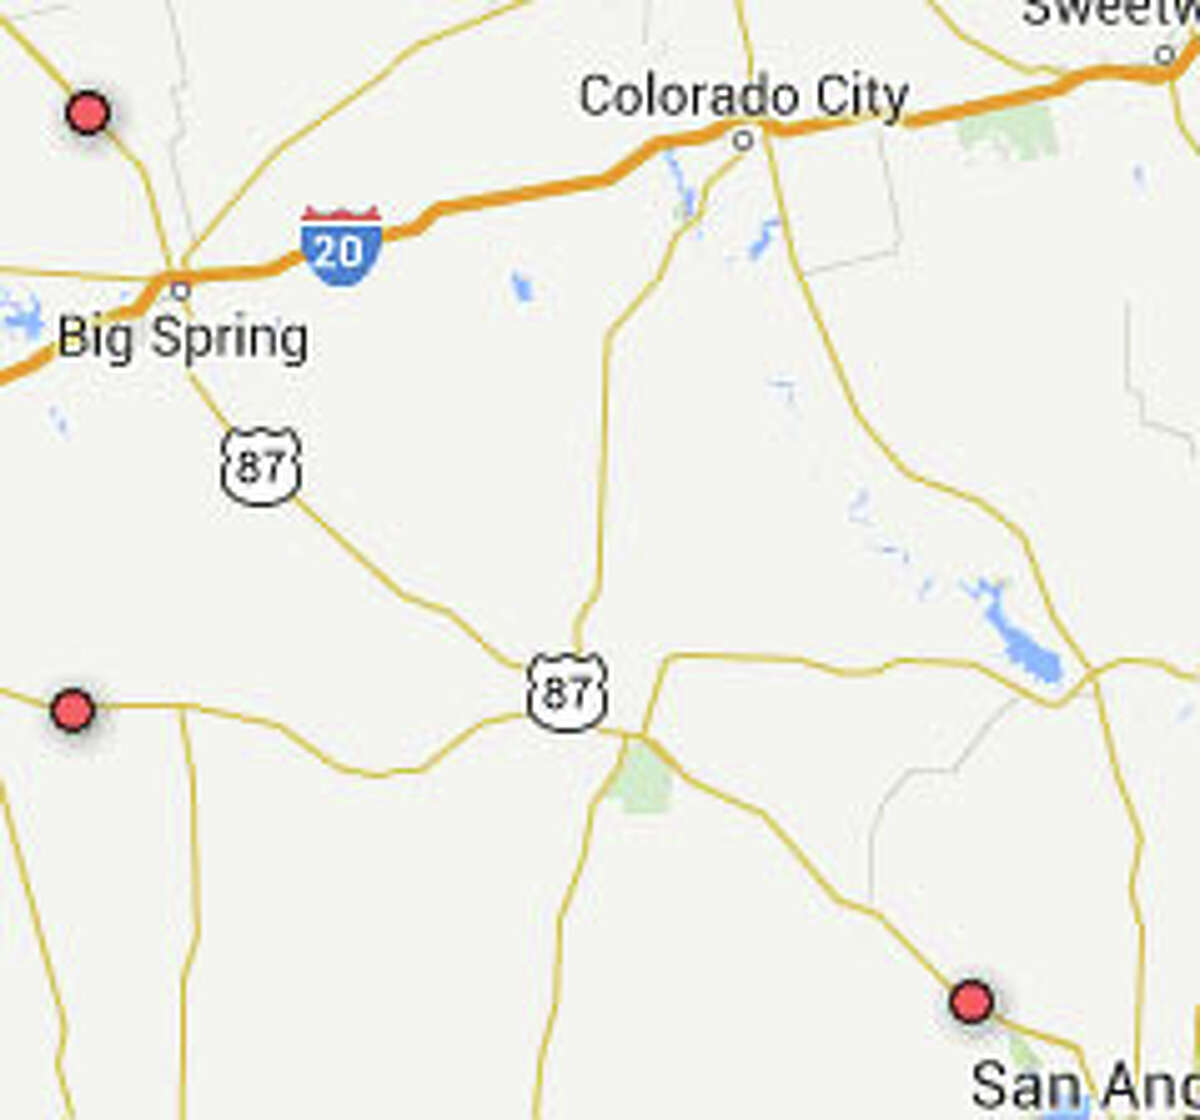 U.S. Highway 87 Rank: 12 (tie)Triple fatalities: Nine killed, two injured in 3 accidentsOverall fatalities 2010-2014: 95 Length: 660 miles